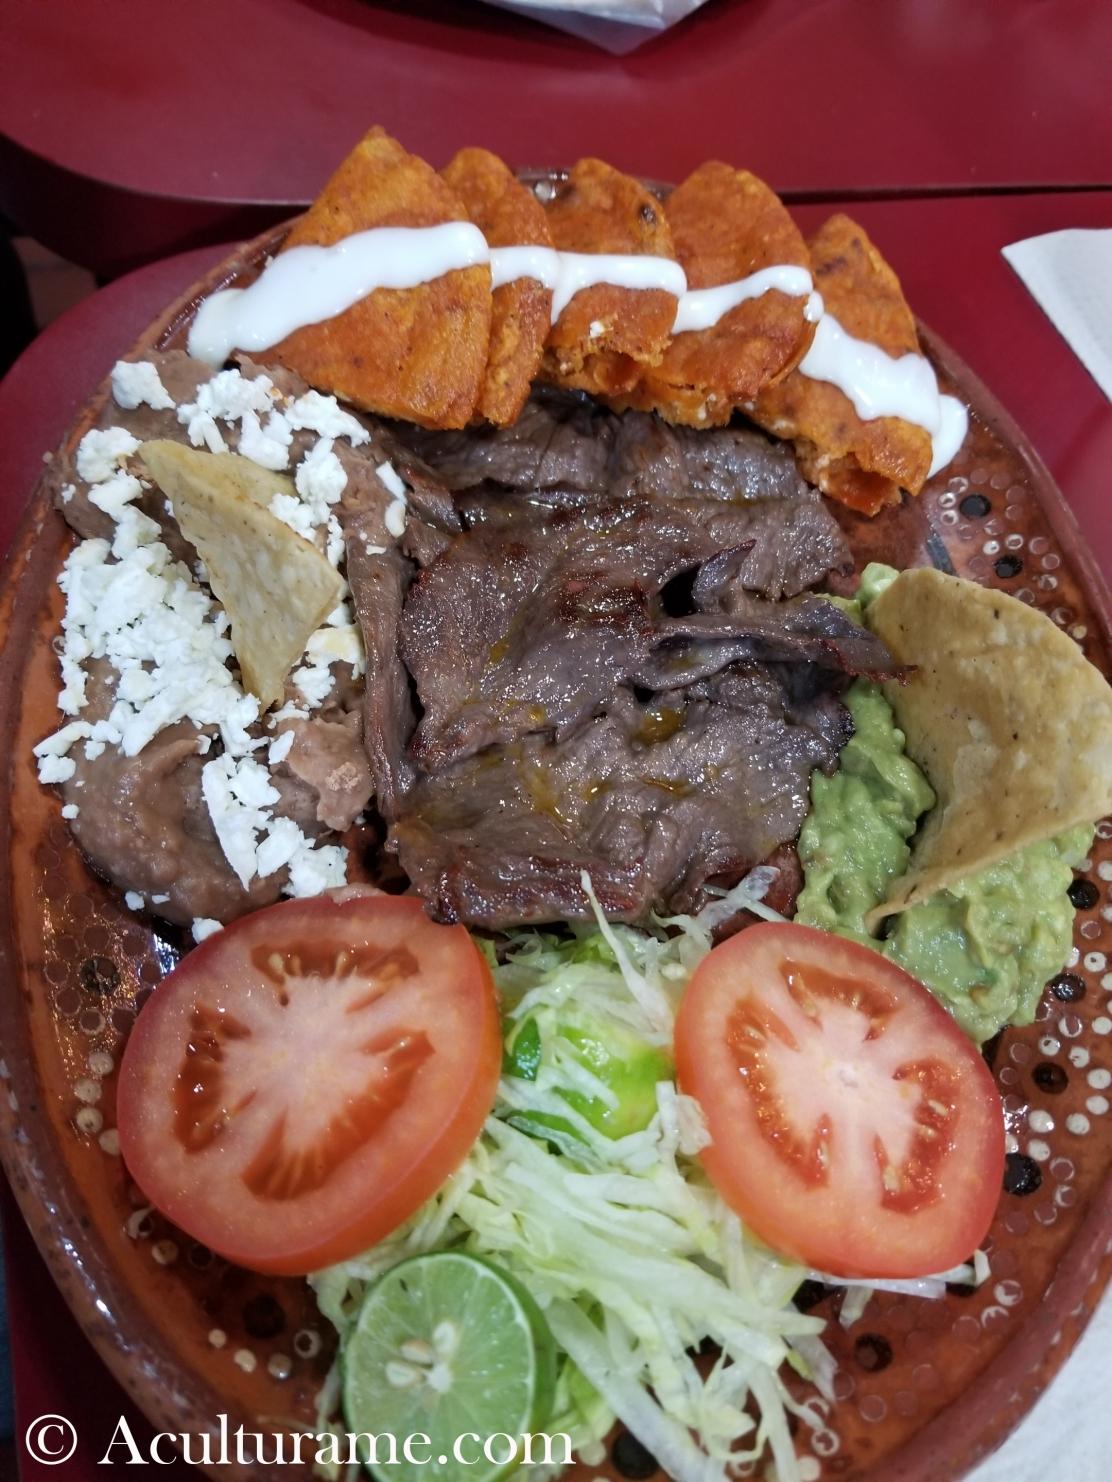 Traditional Enchiladas Potosinas with cecina, guacamole and refried beans.